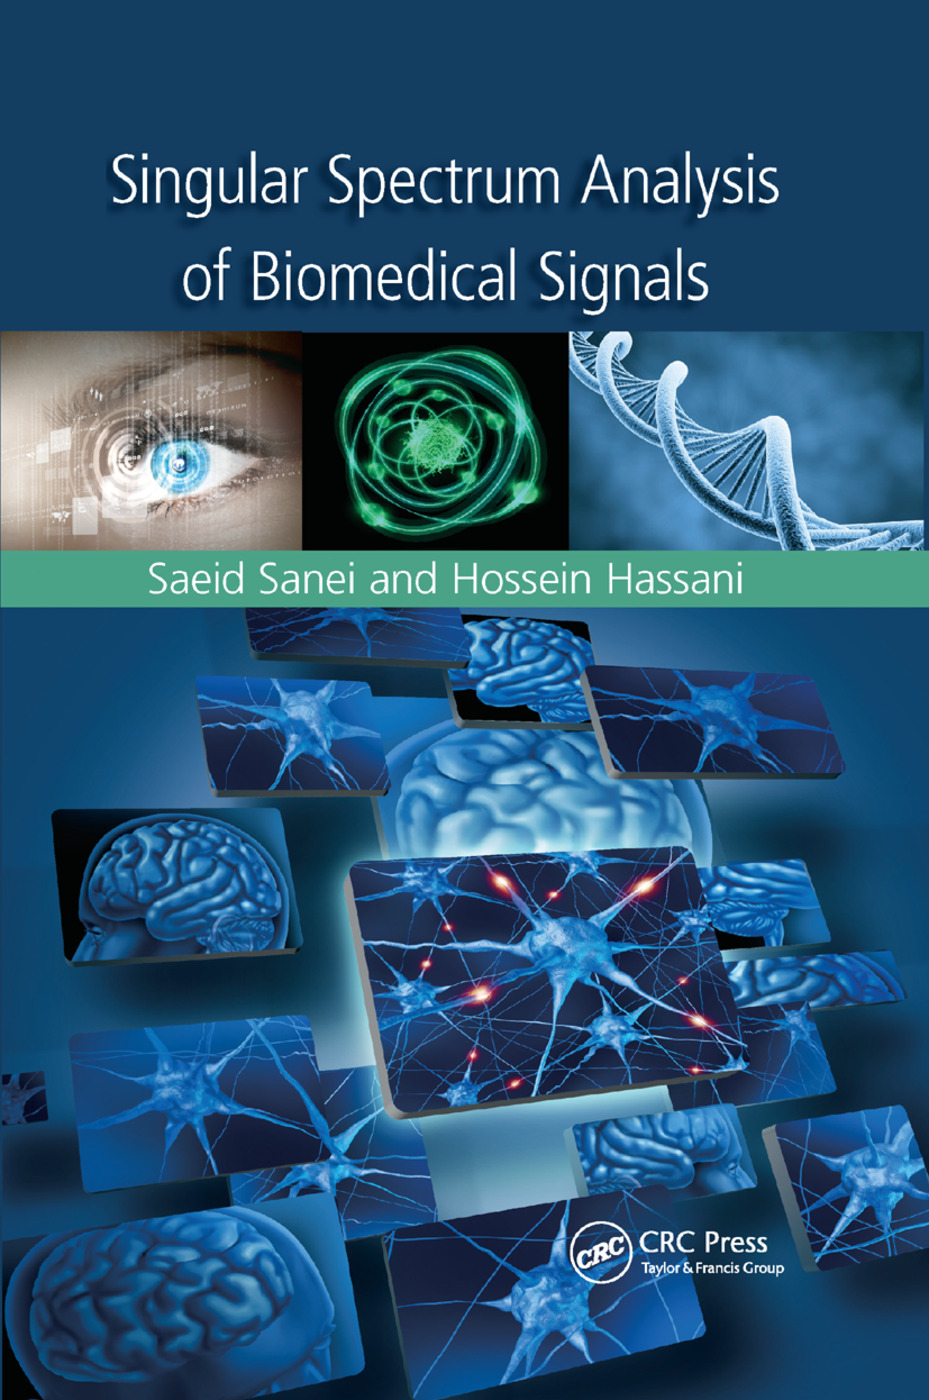 Singular Spectrum Analysis of Biomedical Signals